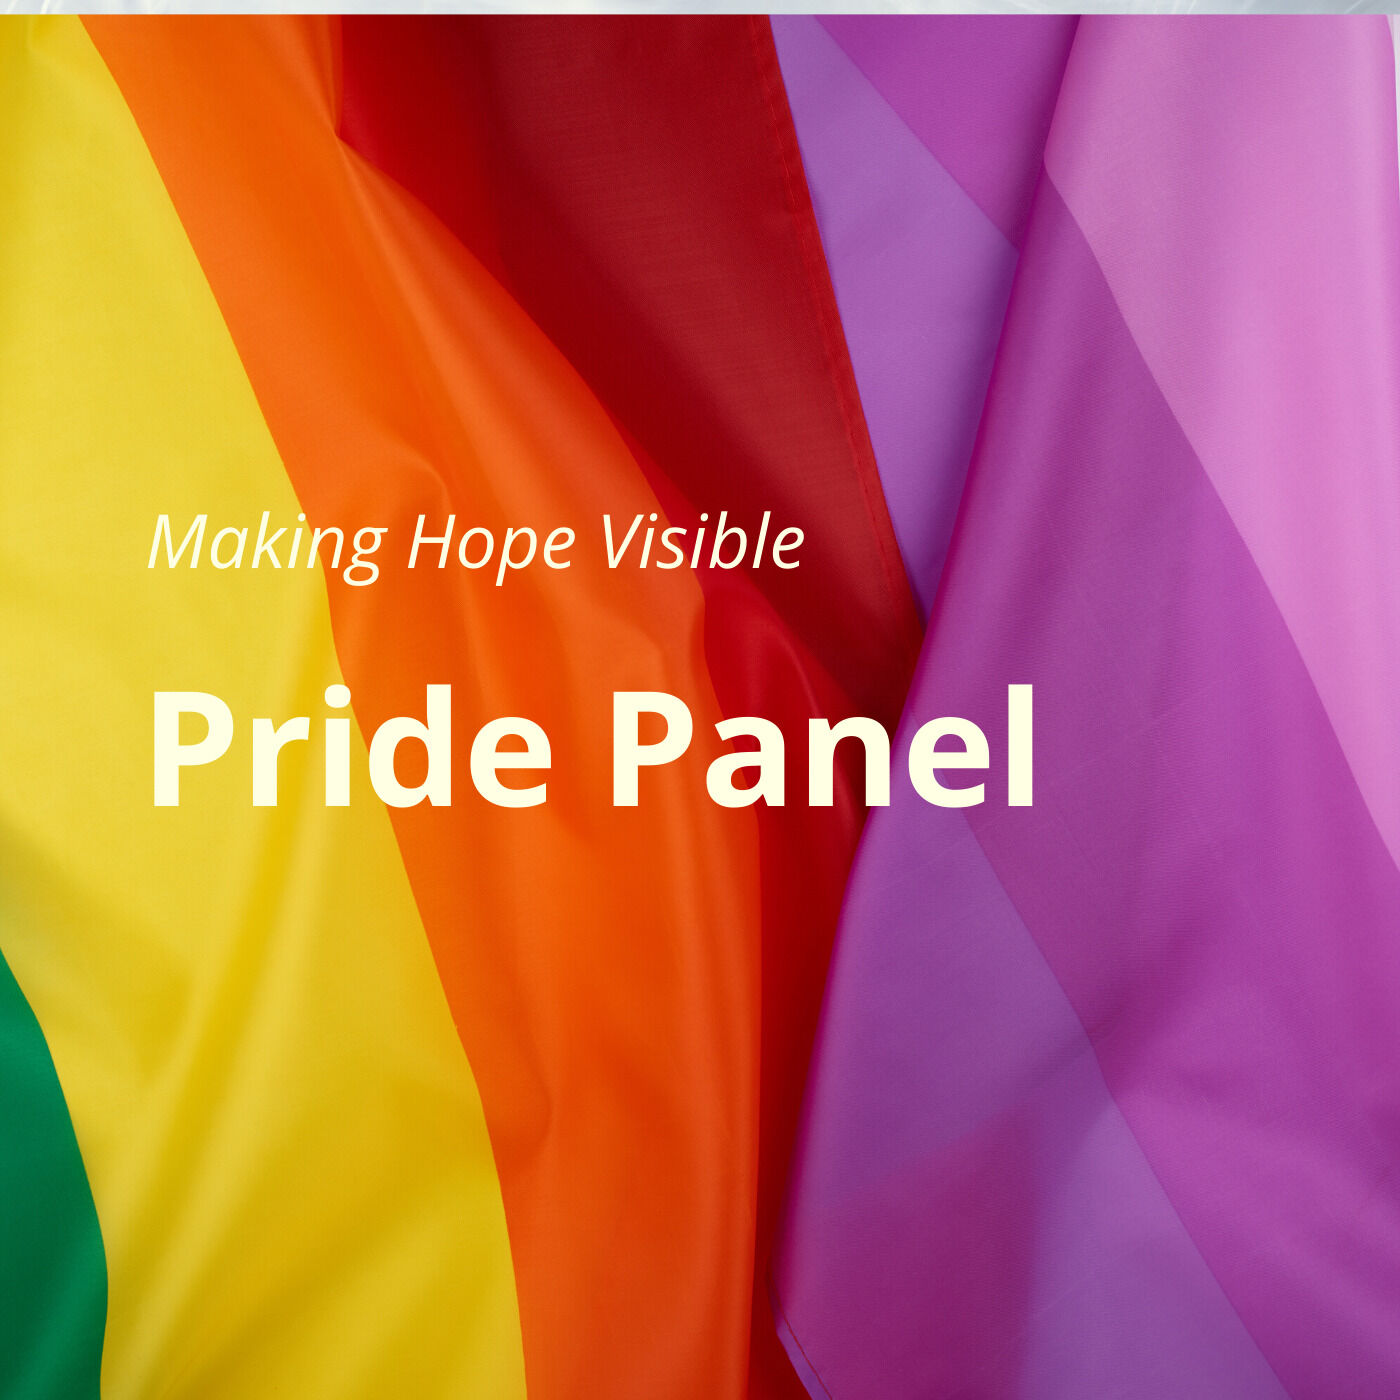 Pride Panel